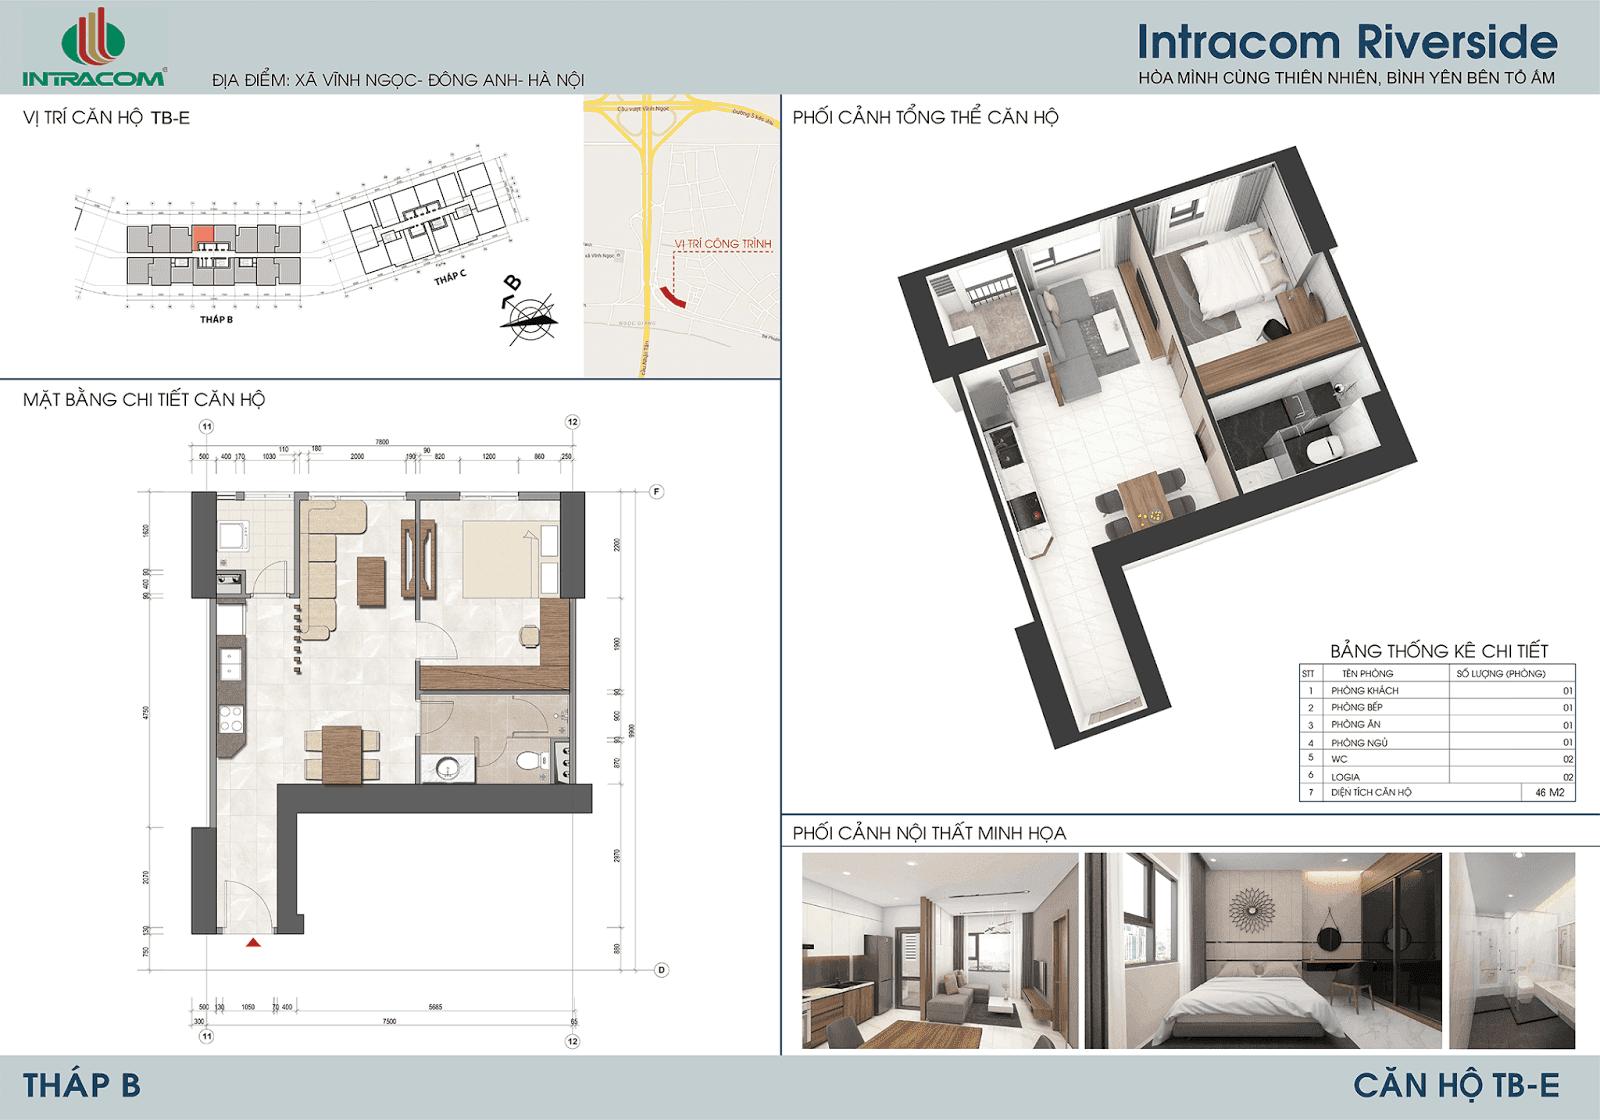 Thiết kế căn 04 - 05 - 46m2